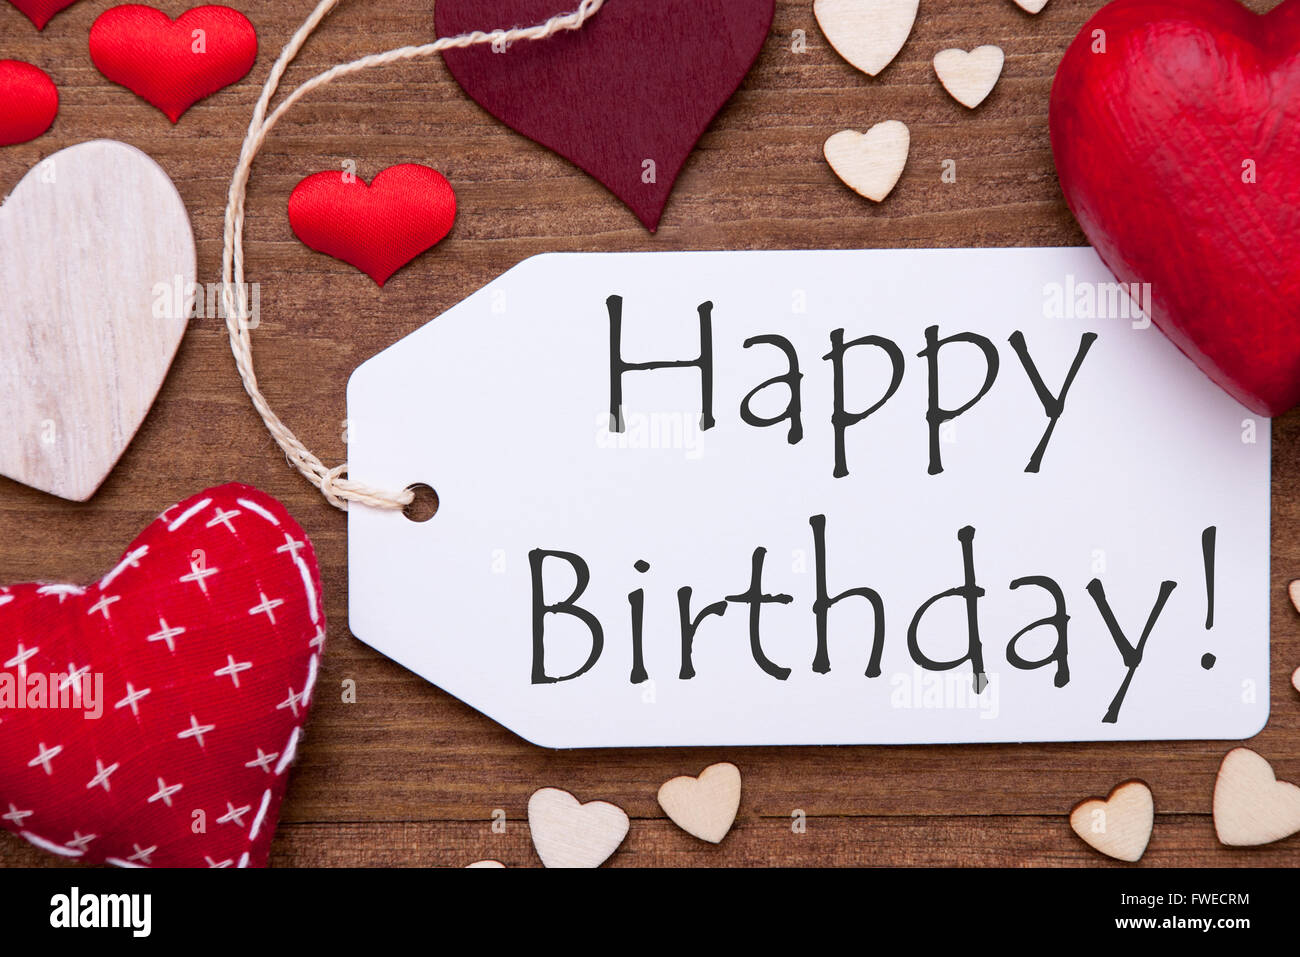 One Label Red Hearts Happy Birthday Macro Stock Photo 101735640